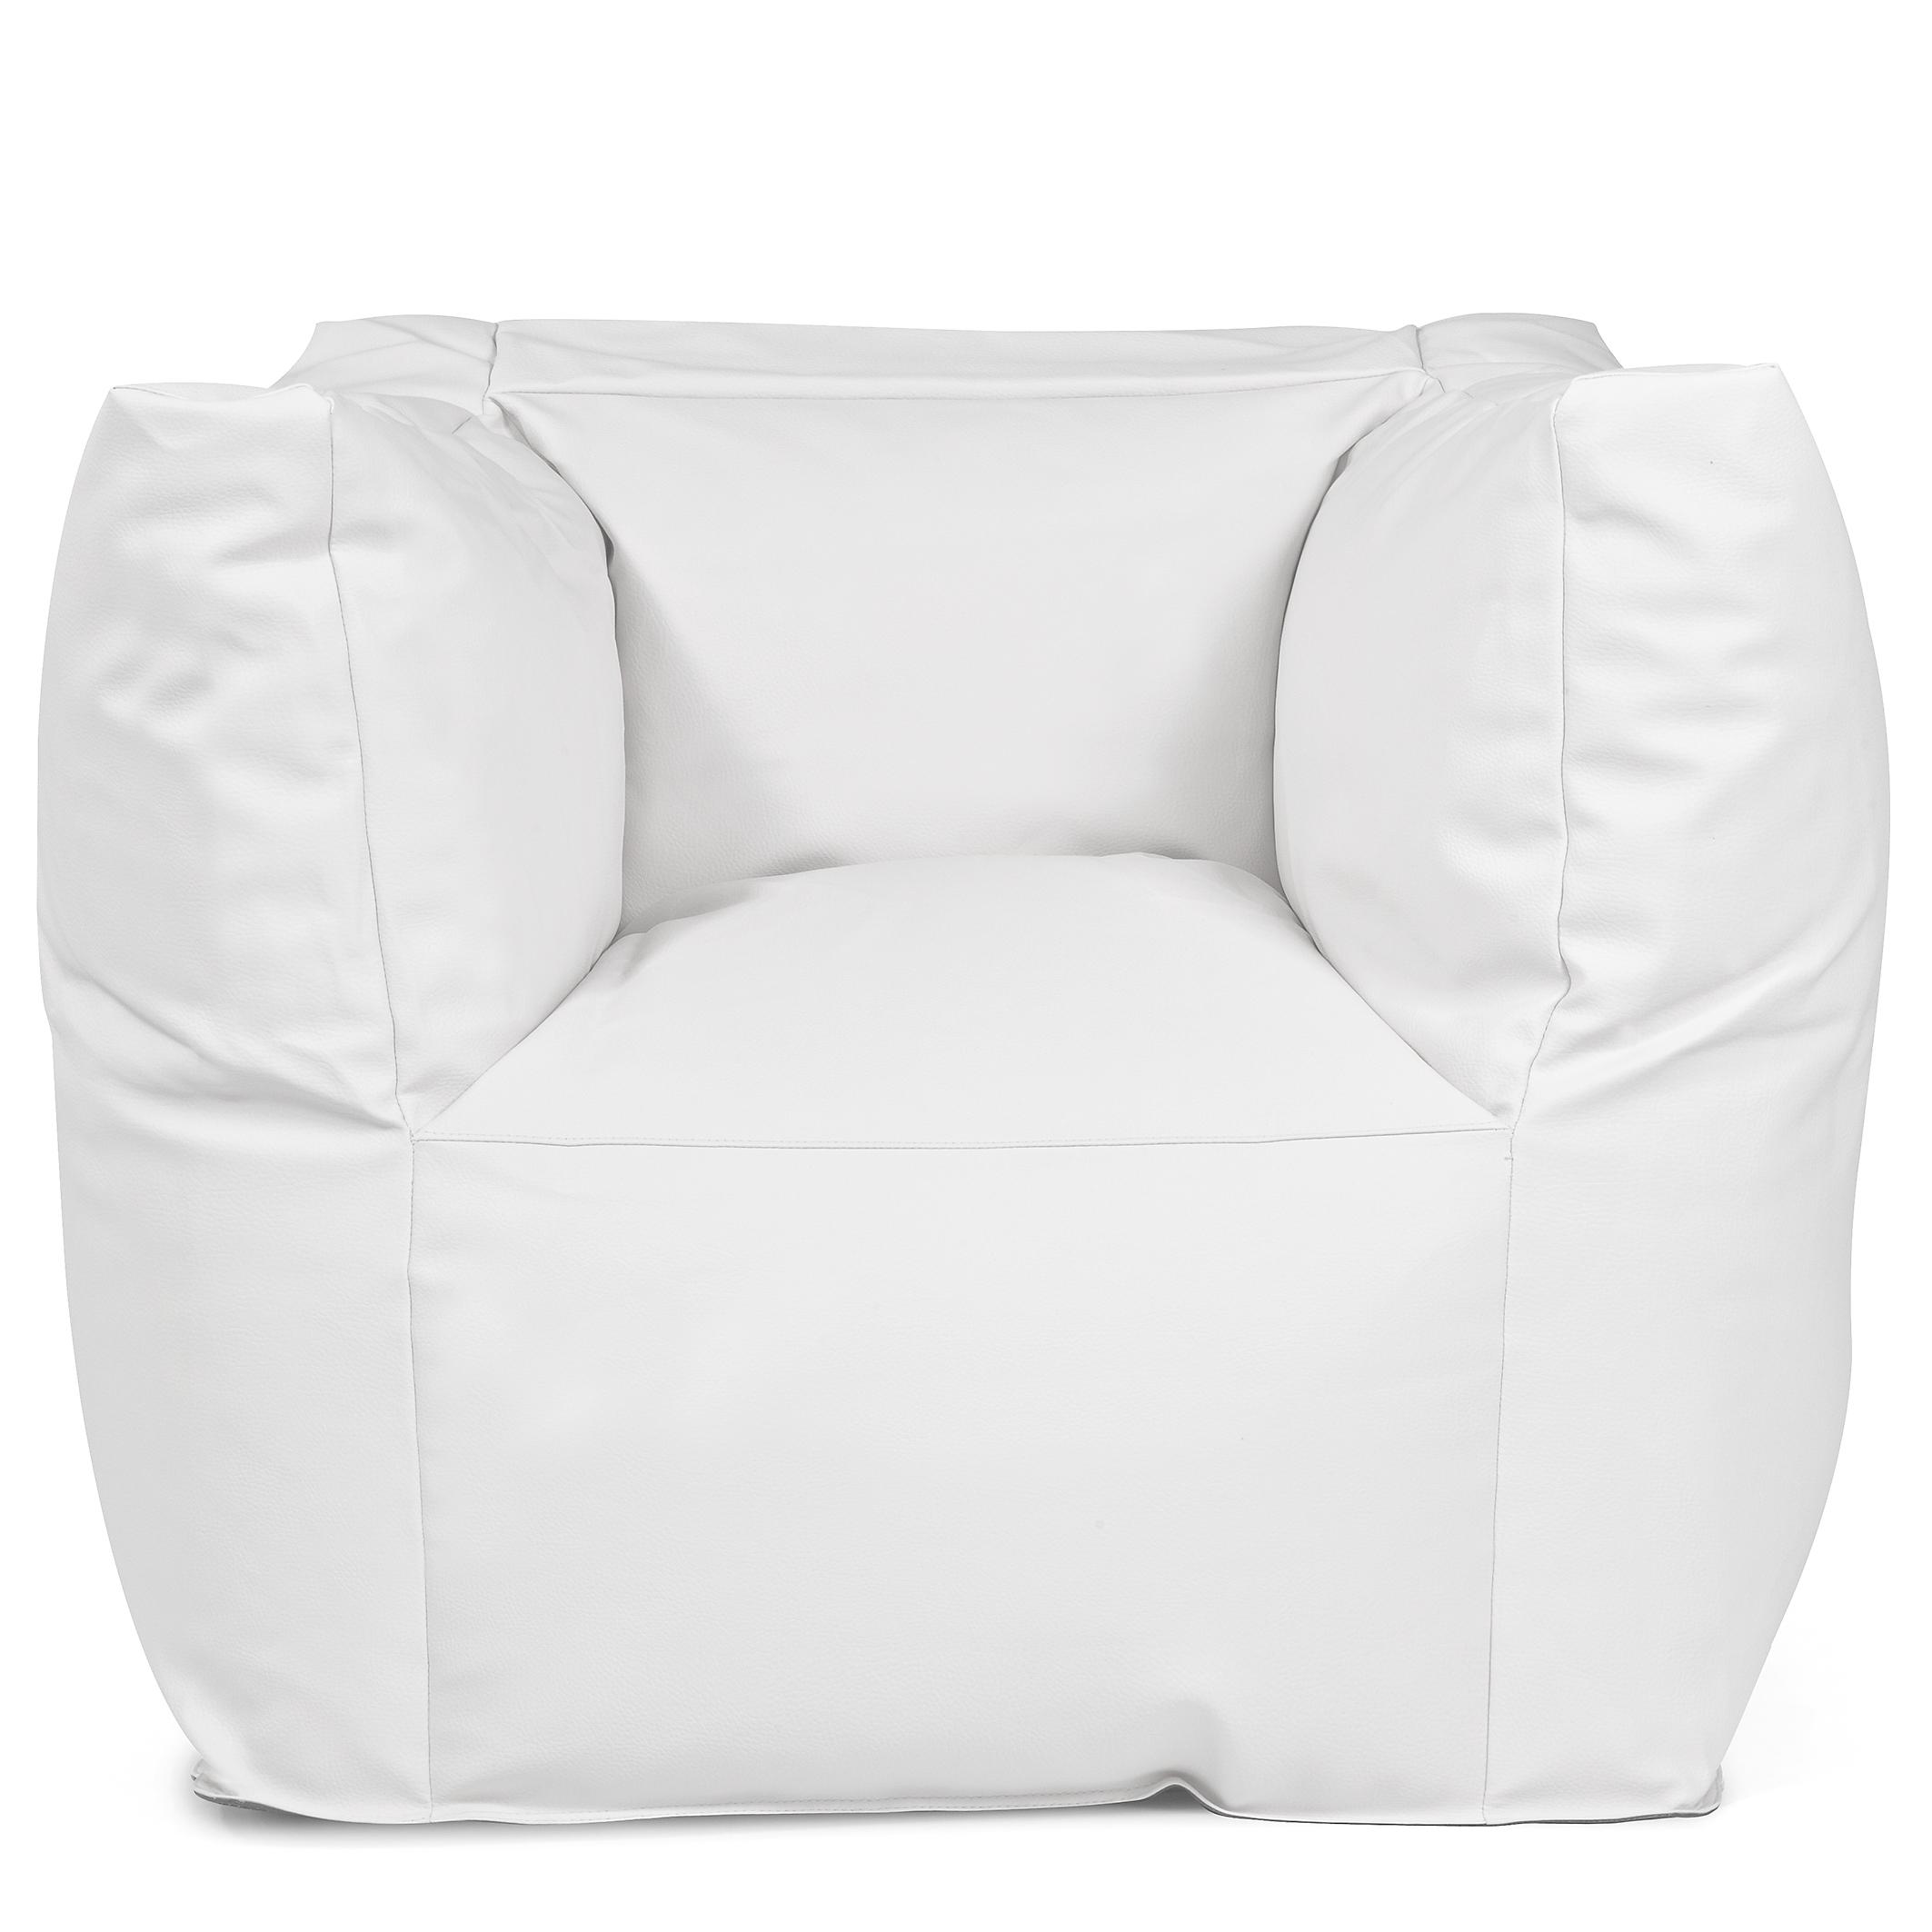 outbag outdoor sitzsack valley 90 x 60 cm wetterfest sessel lounge garten ebay. Black Bedroom Furniture Sets. Home Design Ideas